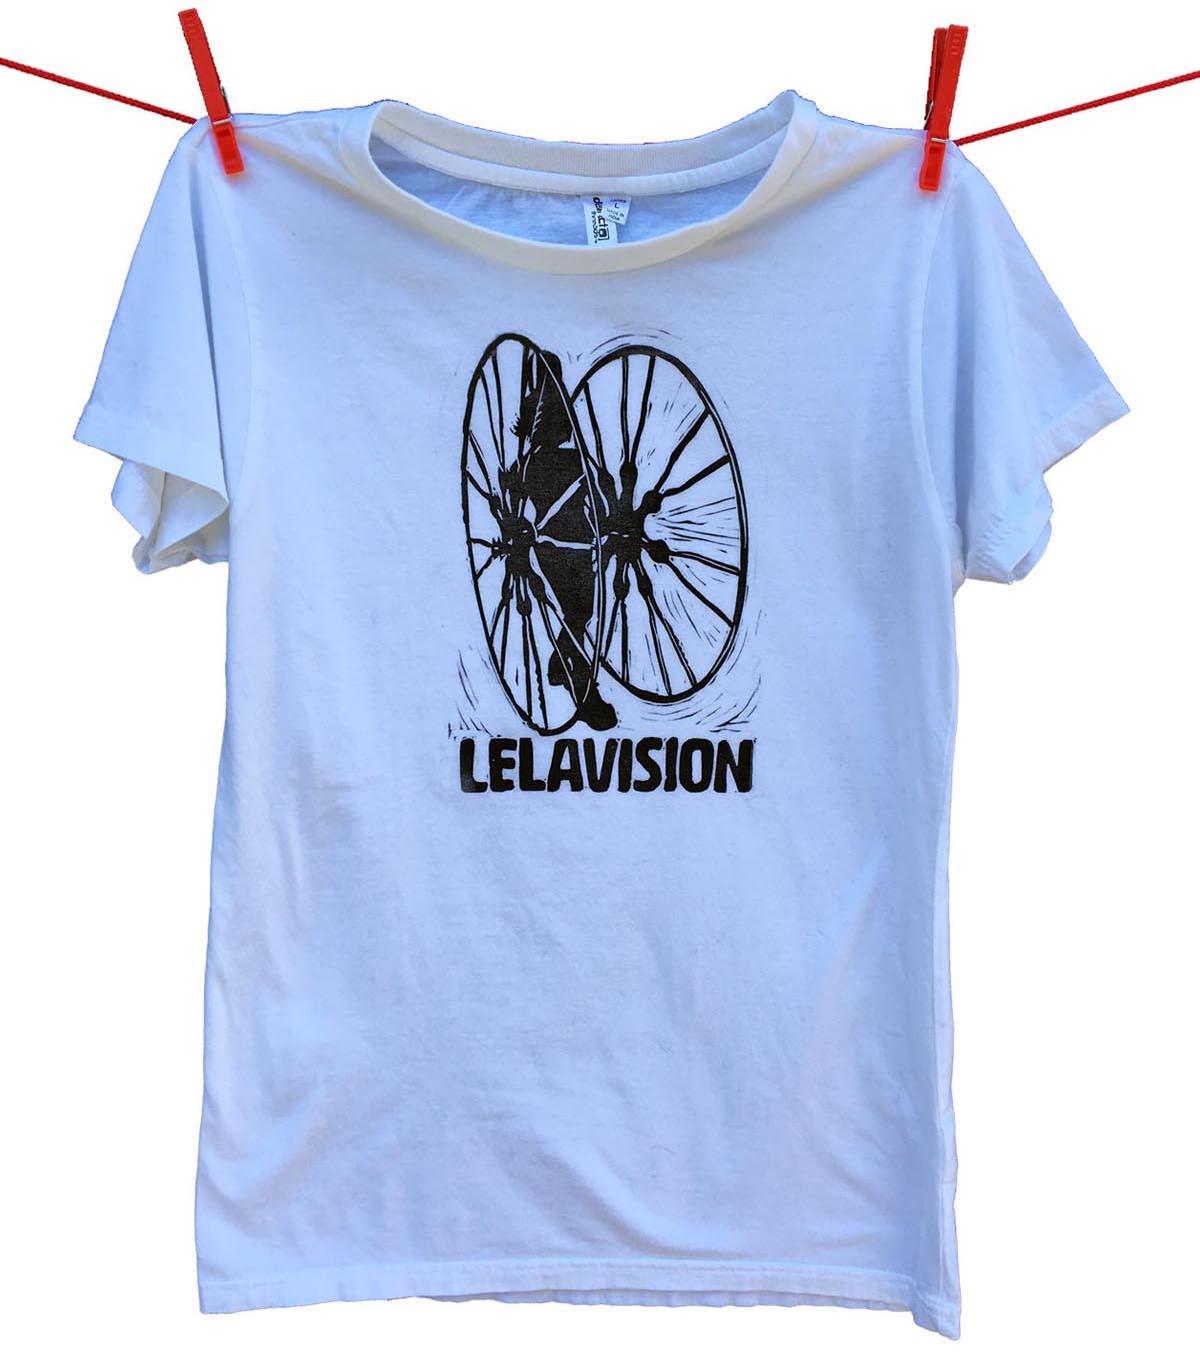 Lelavision